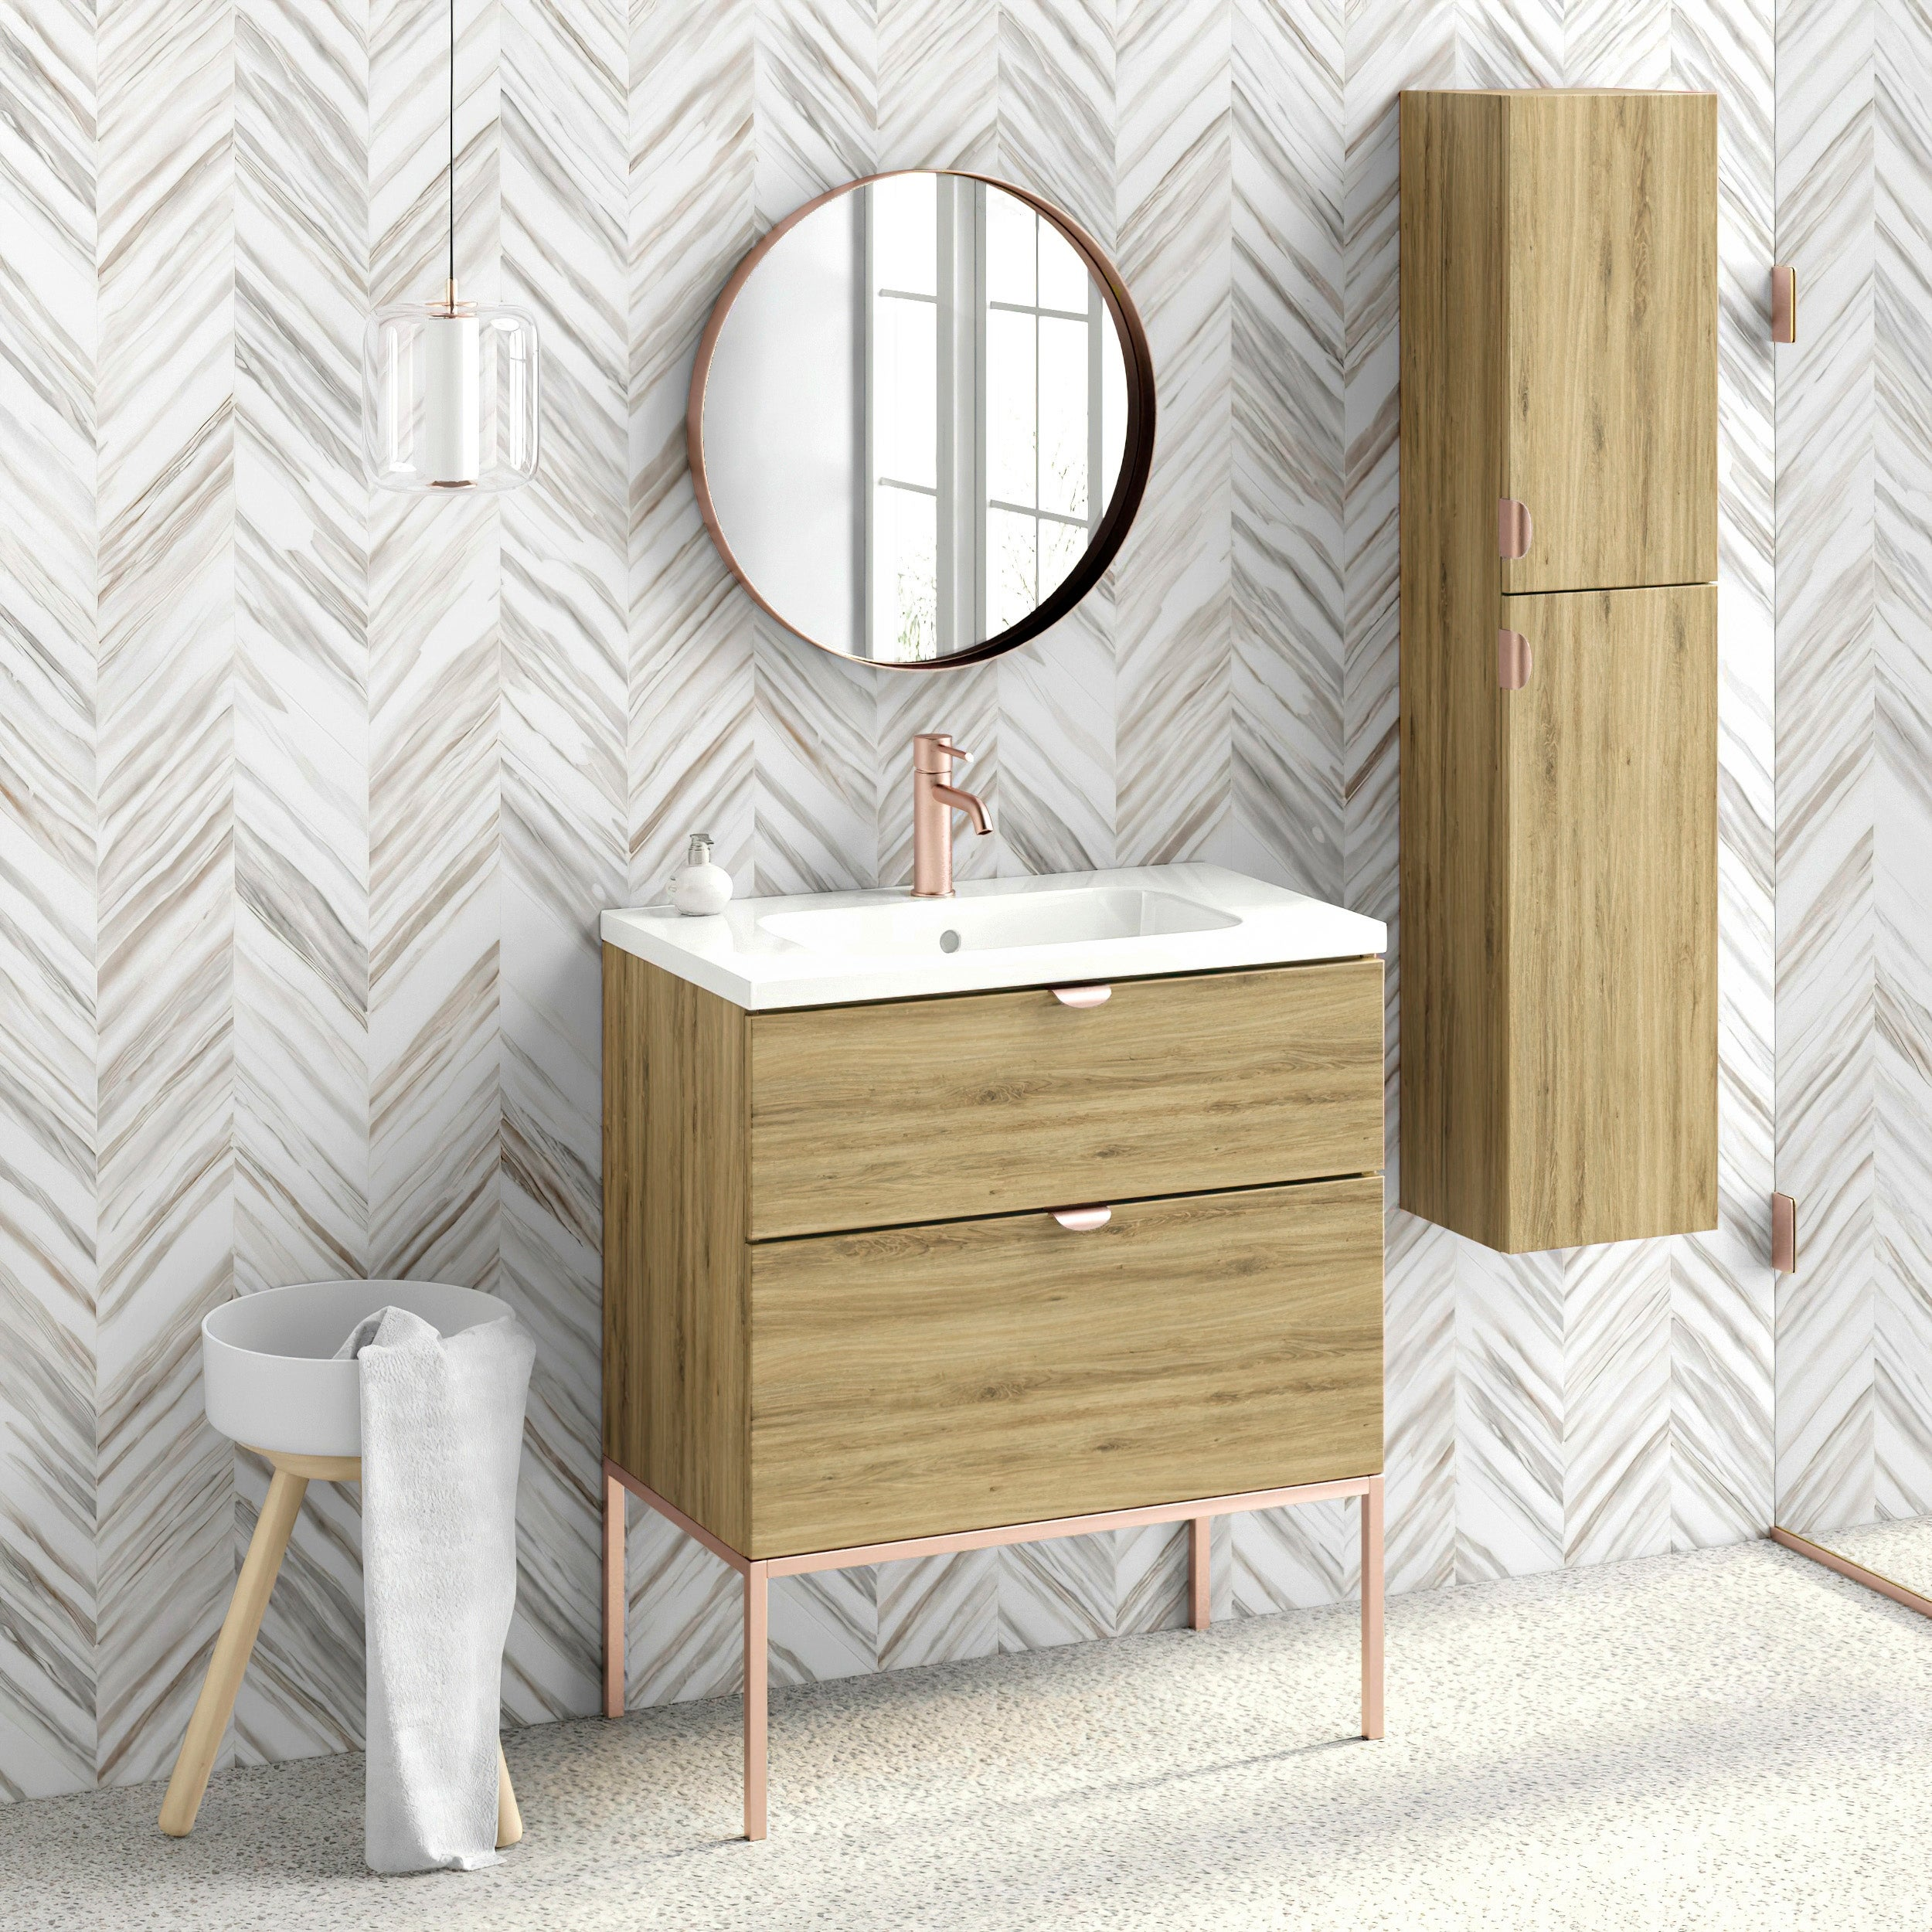 32 Bathroom Vanity Cabinet Ceramic Sink Aspen W32 X H35 X D18 In Wf440 Ginger Oak On Sale Overstock 31507213